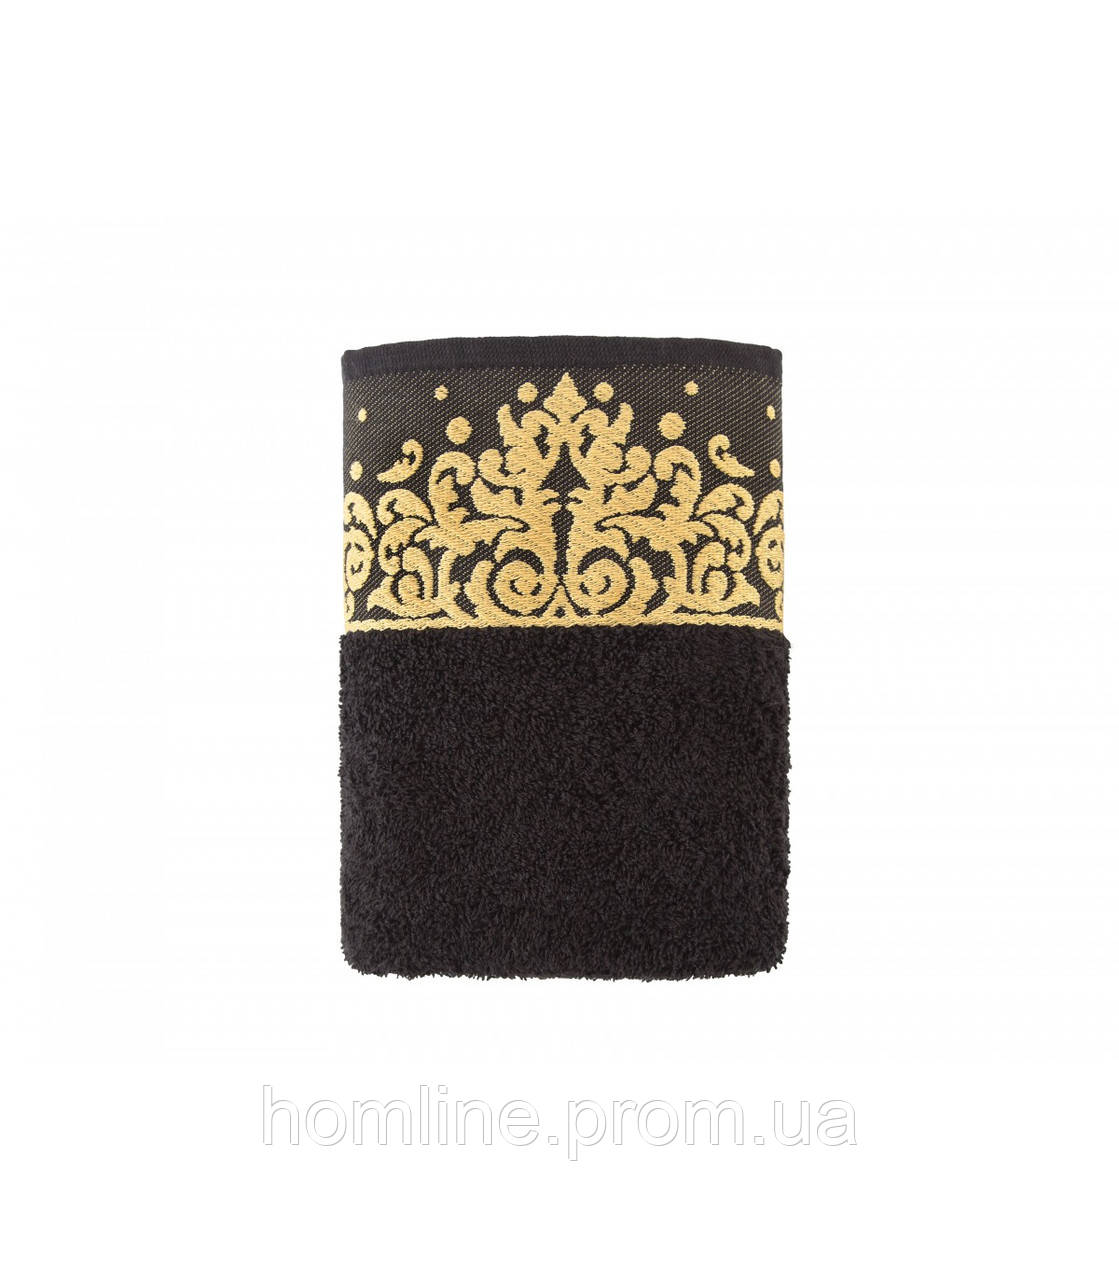 Полотенце Irya Jakarli New Flossy siyah черный 50*90